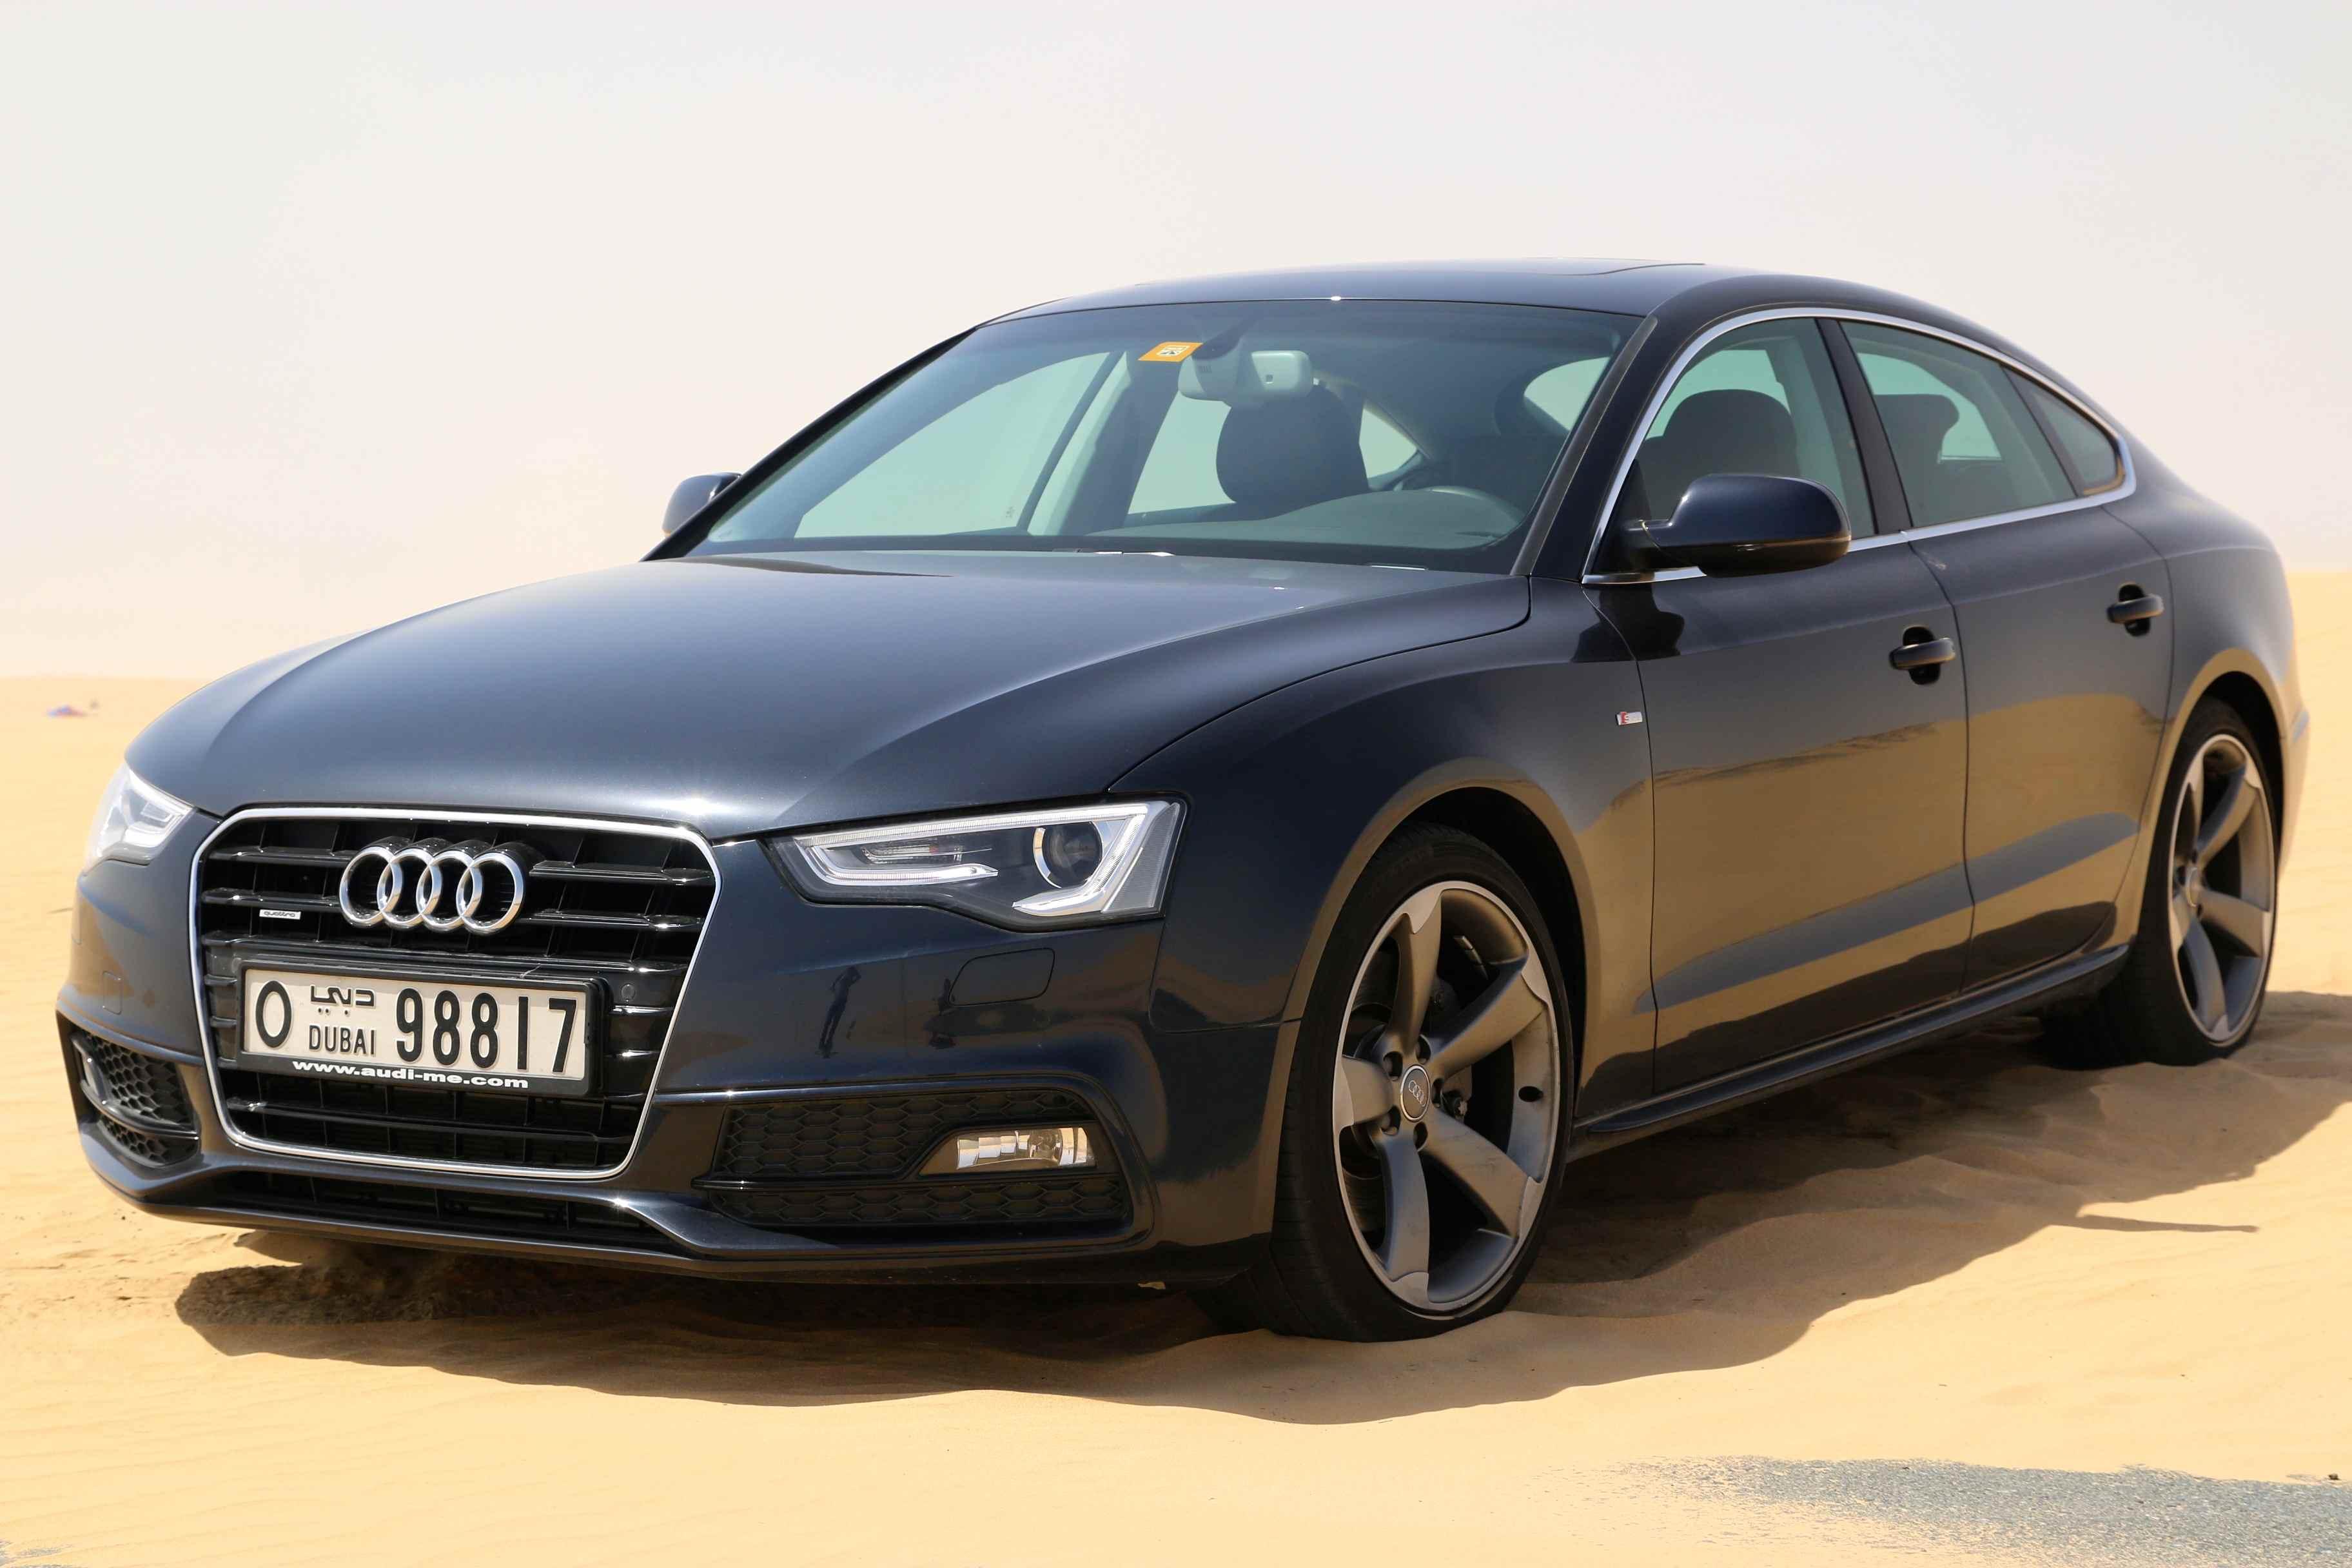 Kelebihan Kekurangan Audi A5 Sportback 2016 Murah Berkualitas